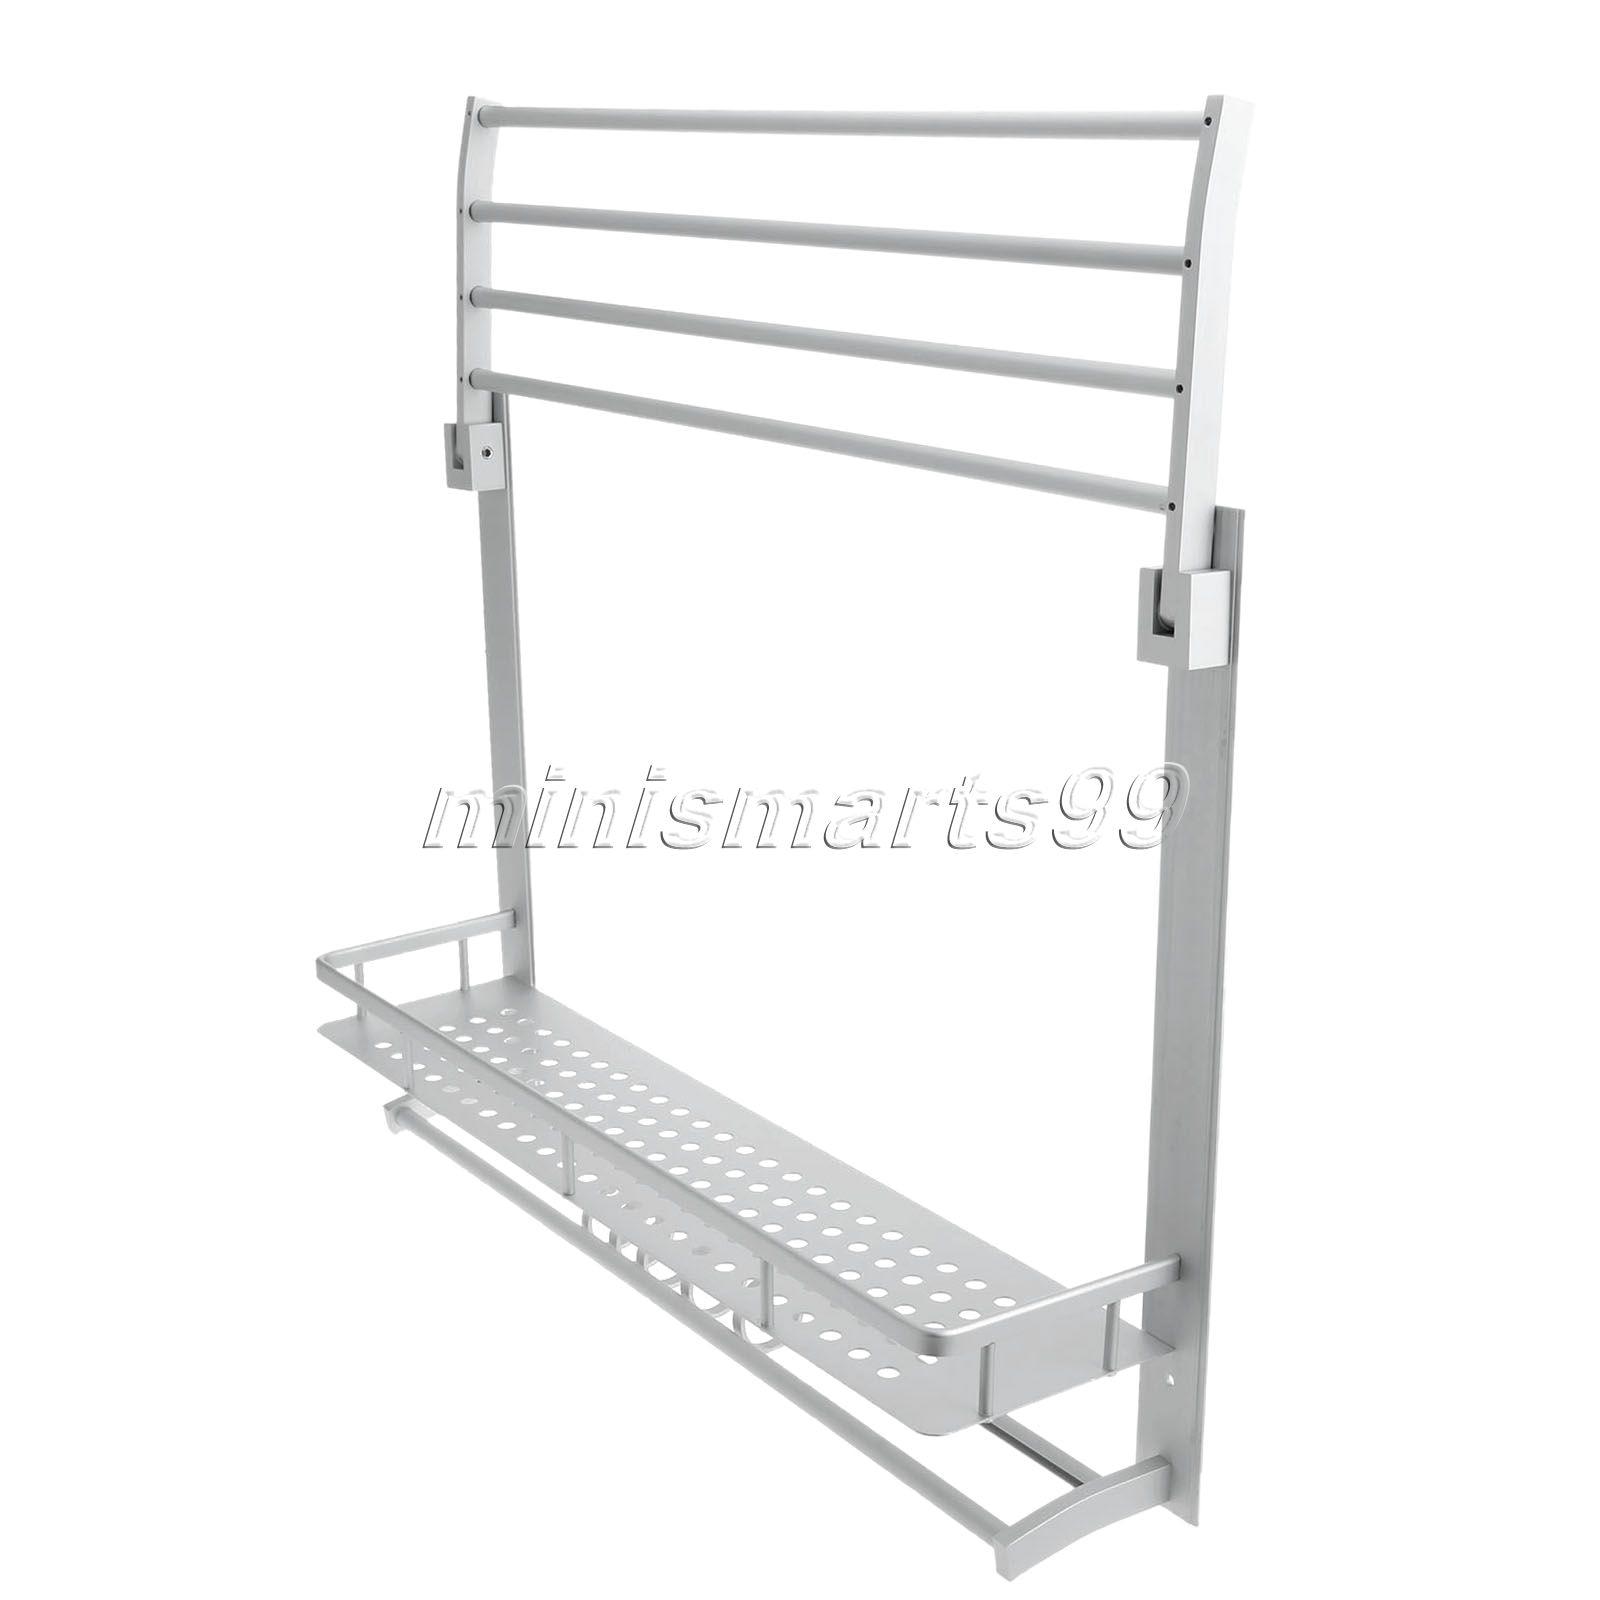 Bathroom Accessories Shelves Aliexpresscom Buy 60cm Double Layers Aluminum Bathroom Rack